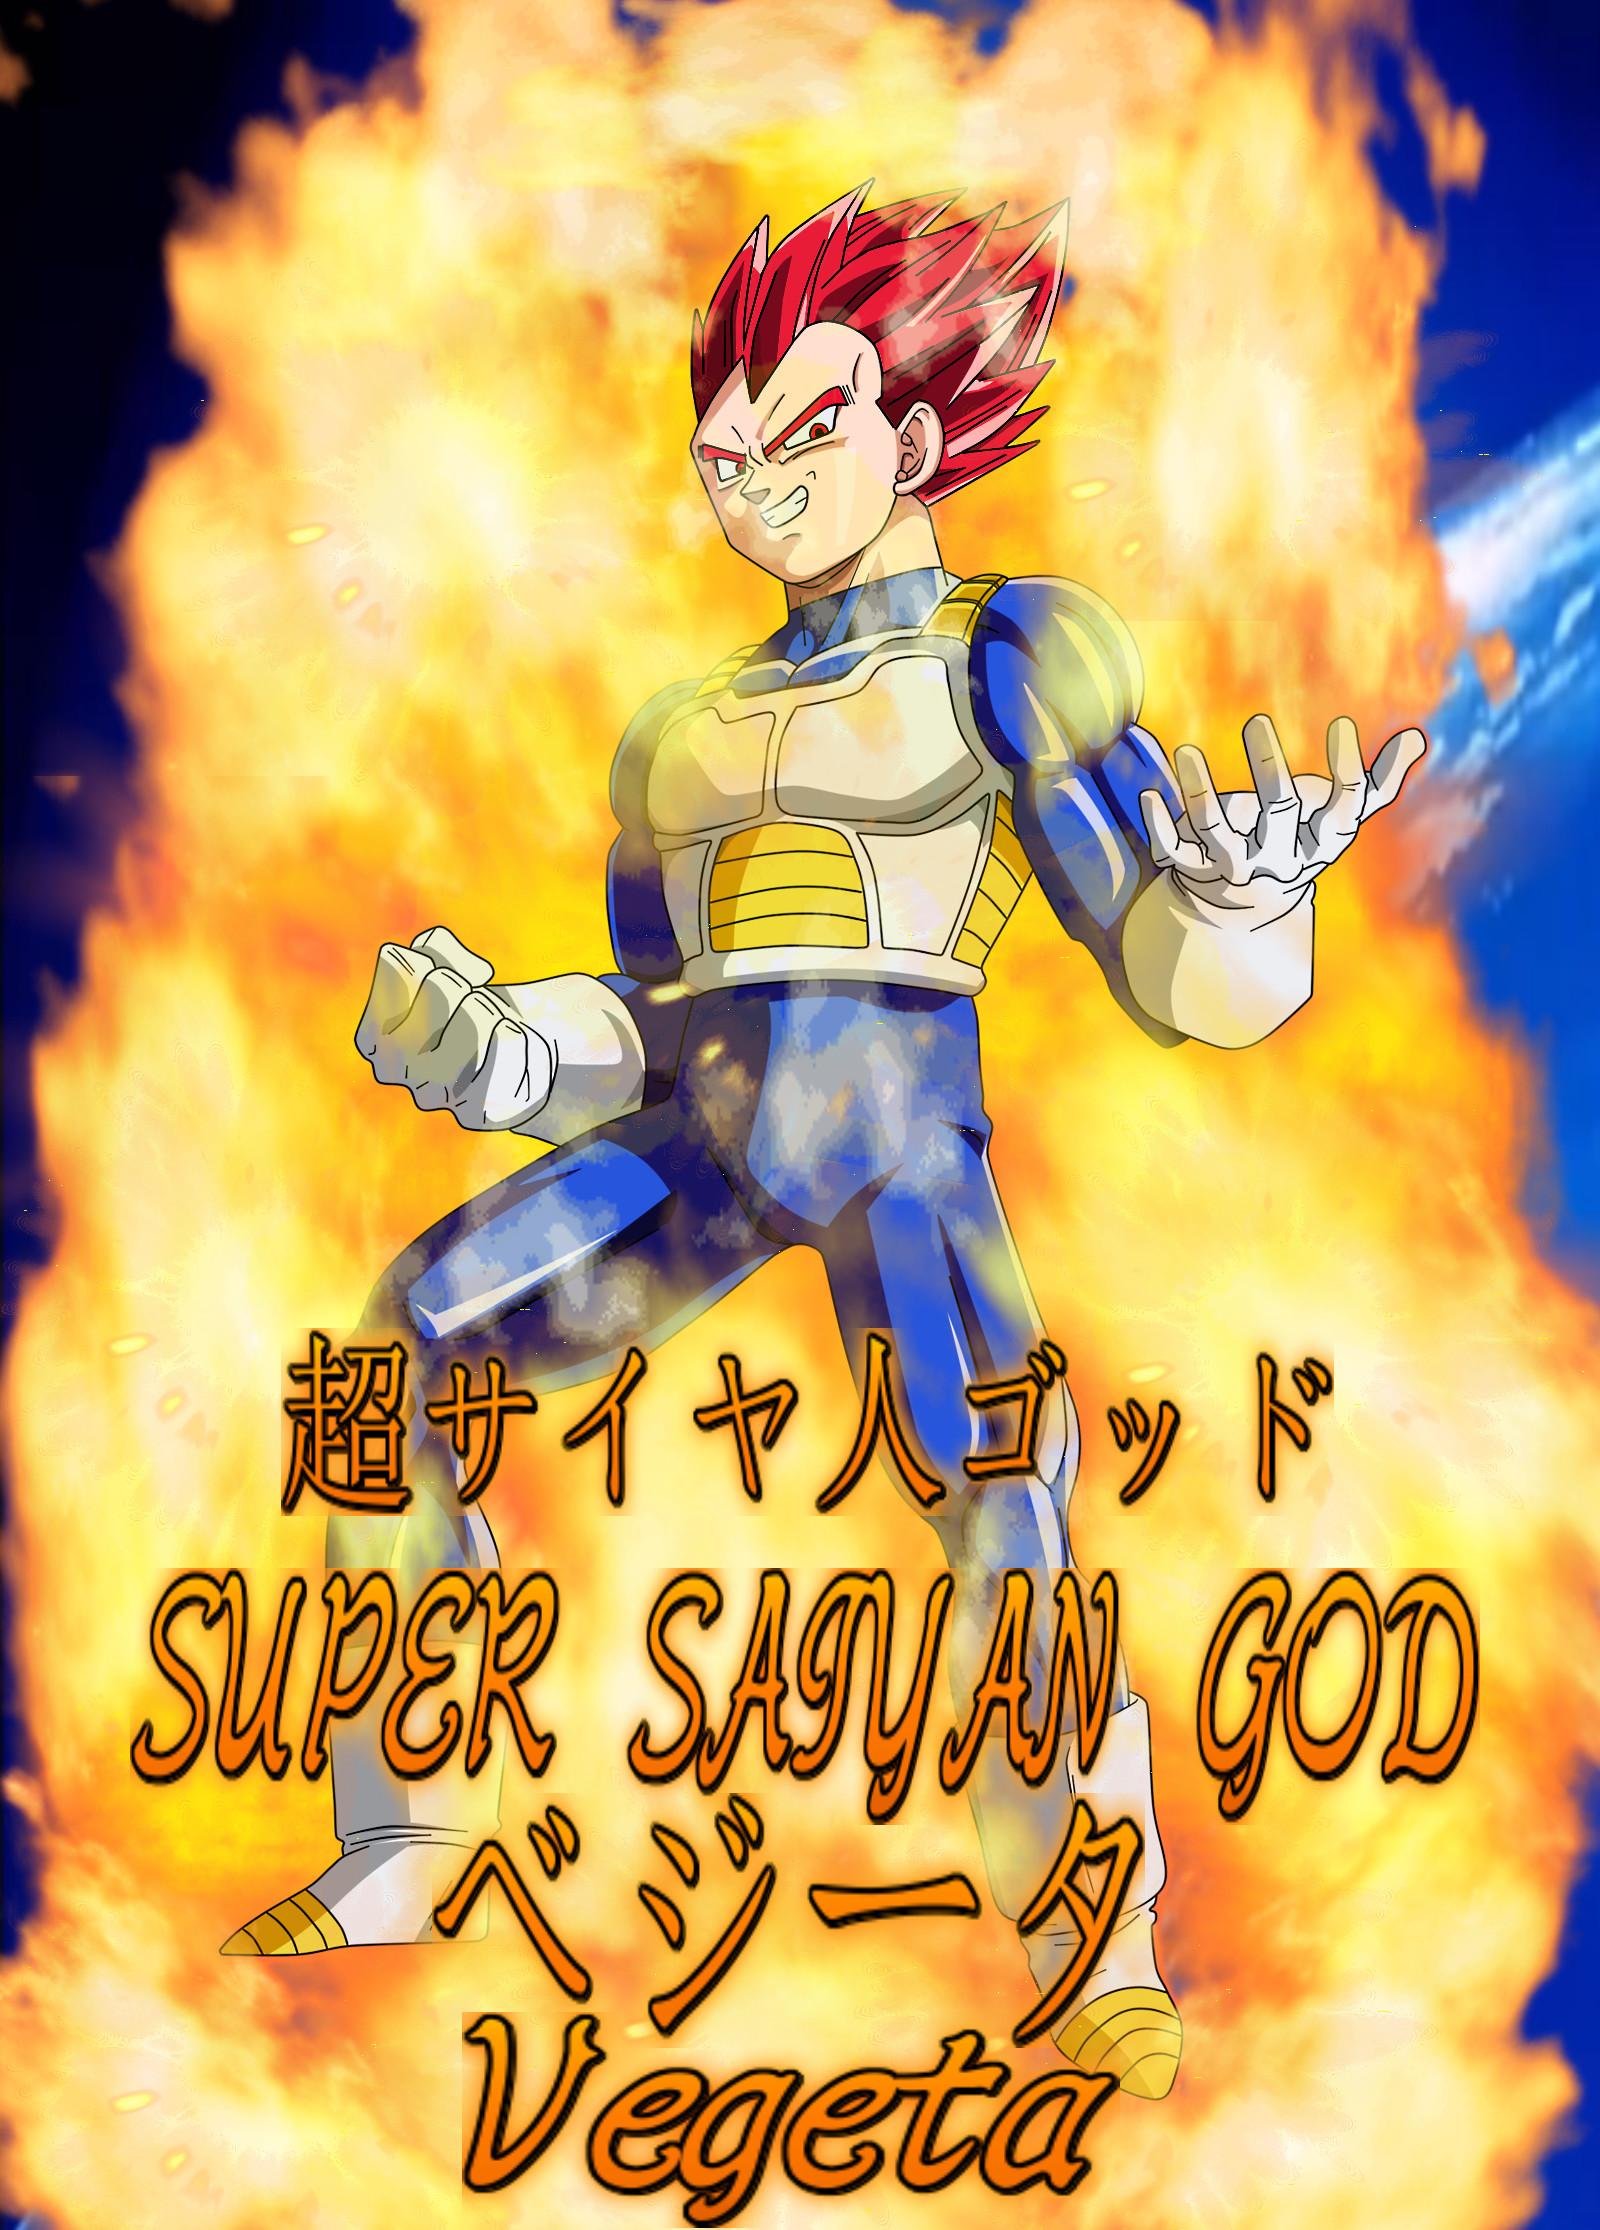 Future Gohan Super Saiyan Super saiyan god vegeta by